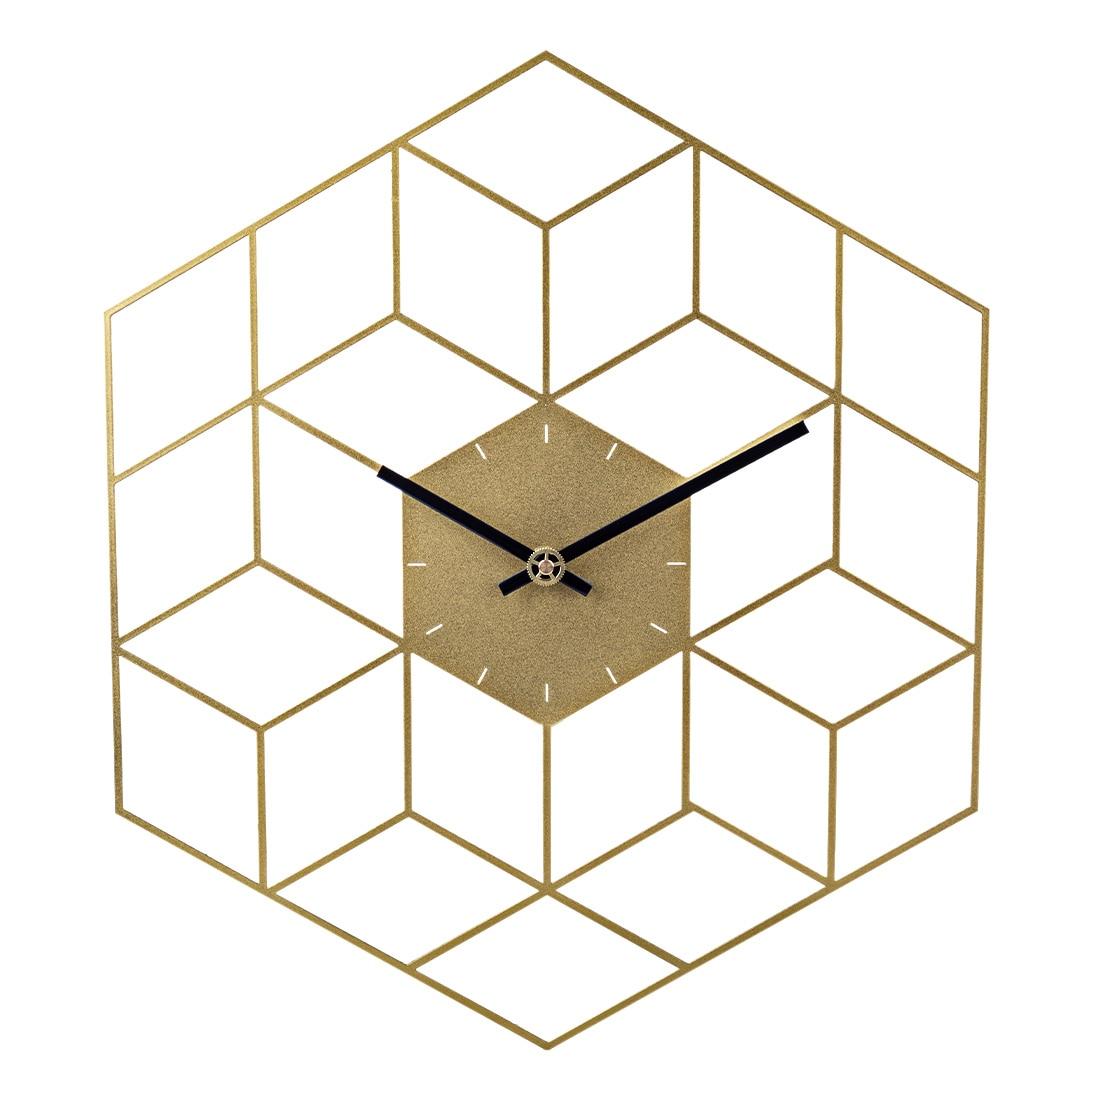 35X40 سنتيمتر الإبداعية الحديد مكعب ساعة حائط ساعة الموقت بطارية تعمل ساعة حائط صامت s ديكور المنزل الديكور-مقياس الذهبي